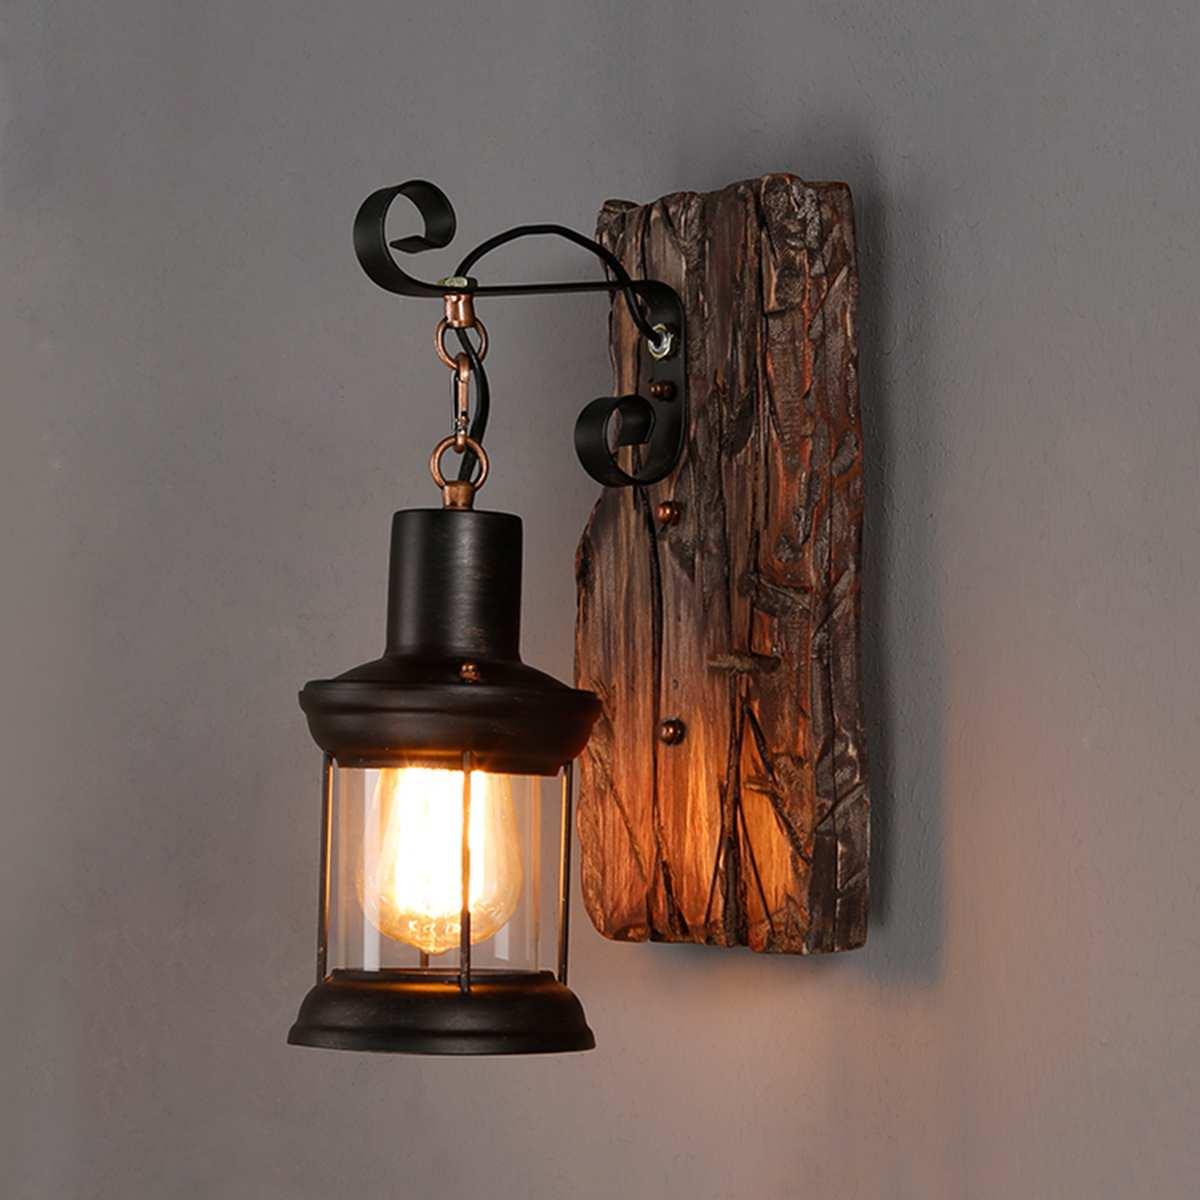 Retro Loft Style Rural Industrial Wall Lamp Wall Sconce Light Lighting  Fixtures Porch Hallway Lighting - Best Deal #12B2D   Cicig